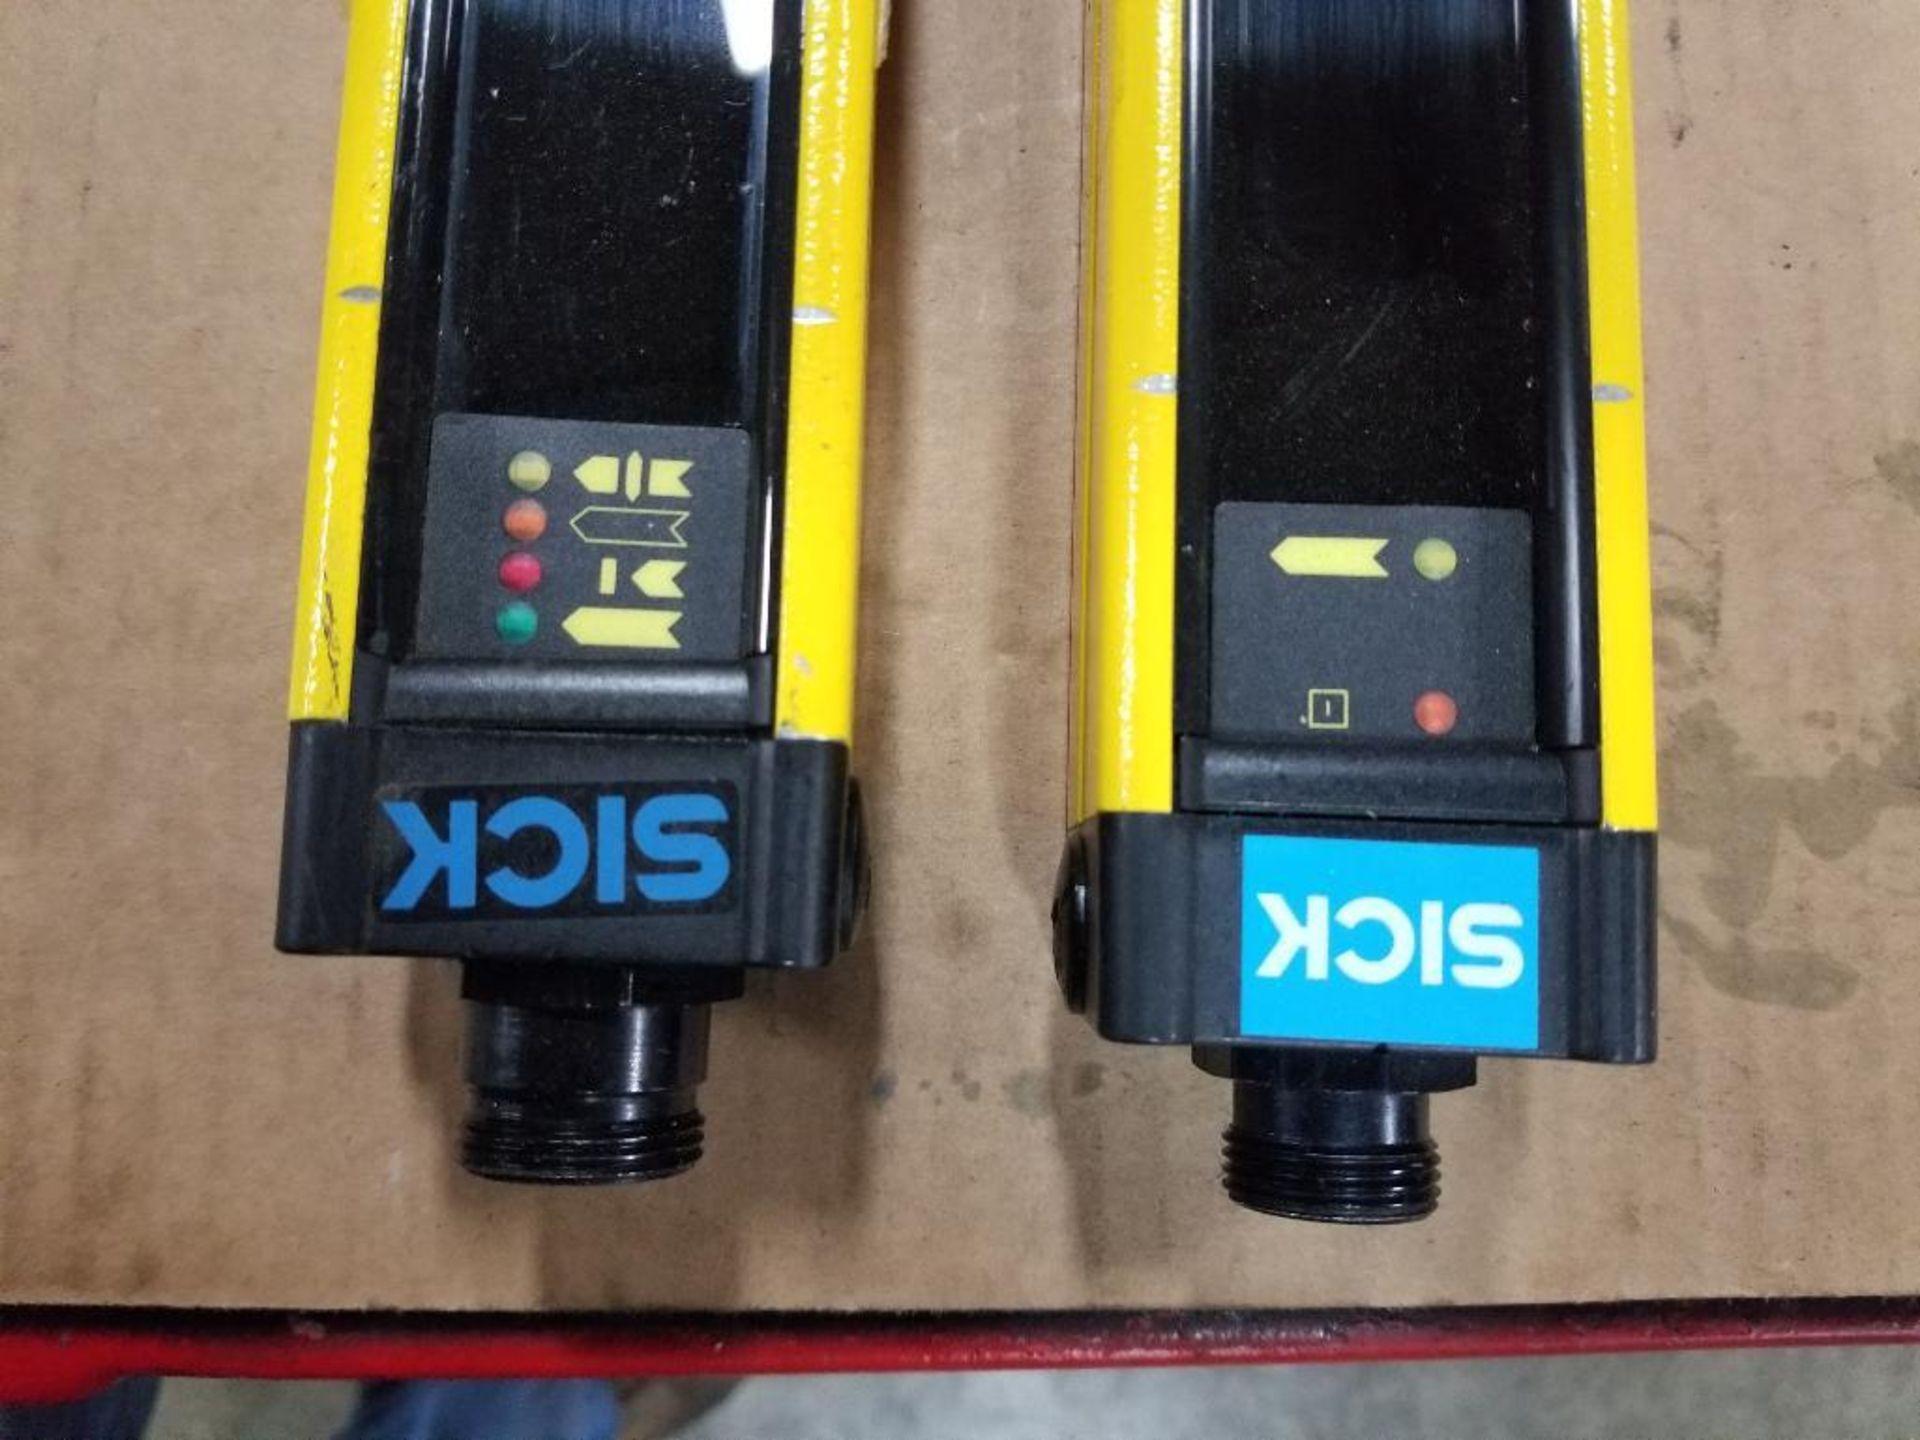 SICK Light curtain transmitter / receiver set. 14-FGS 1-012-762, 1-012-761. - Image 3 of 9